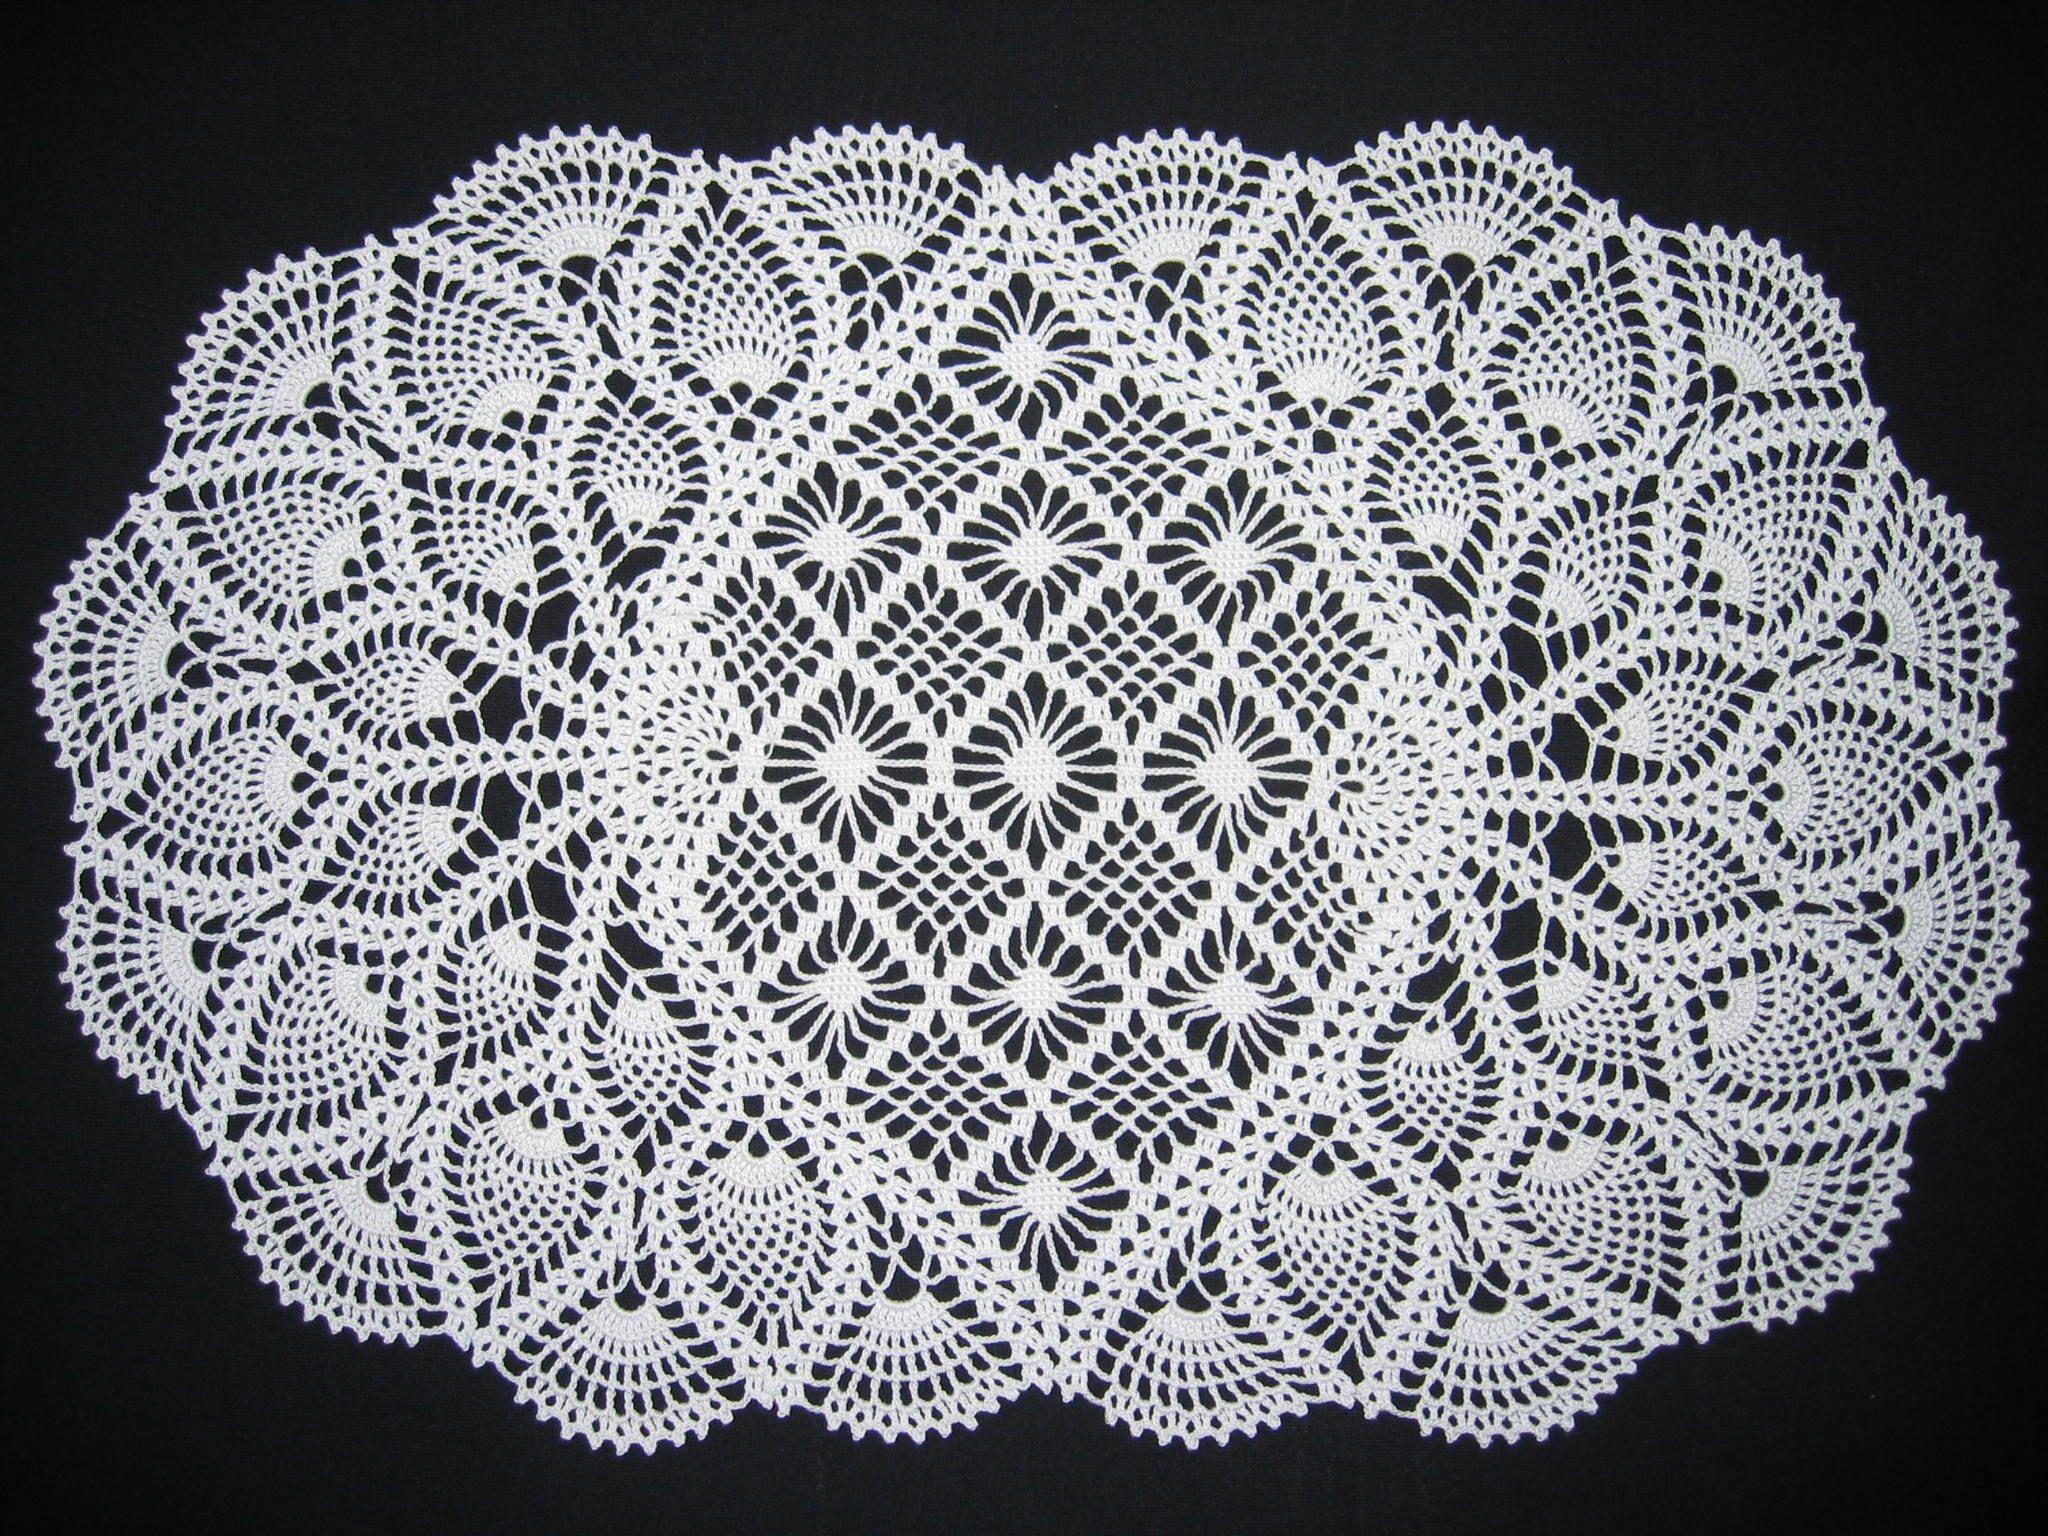 Oval crochet pineapple doily | doilies | Pinterest | Crochet ...